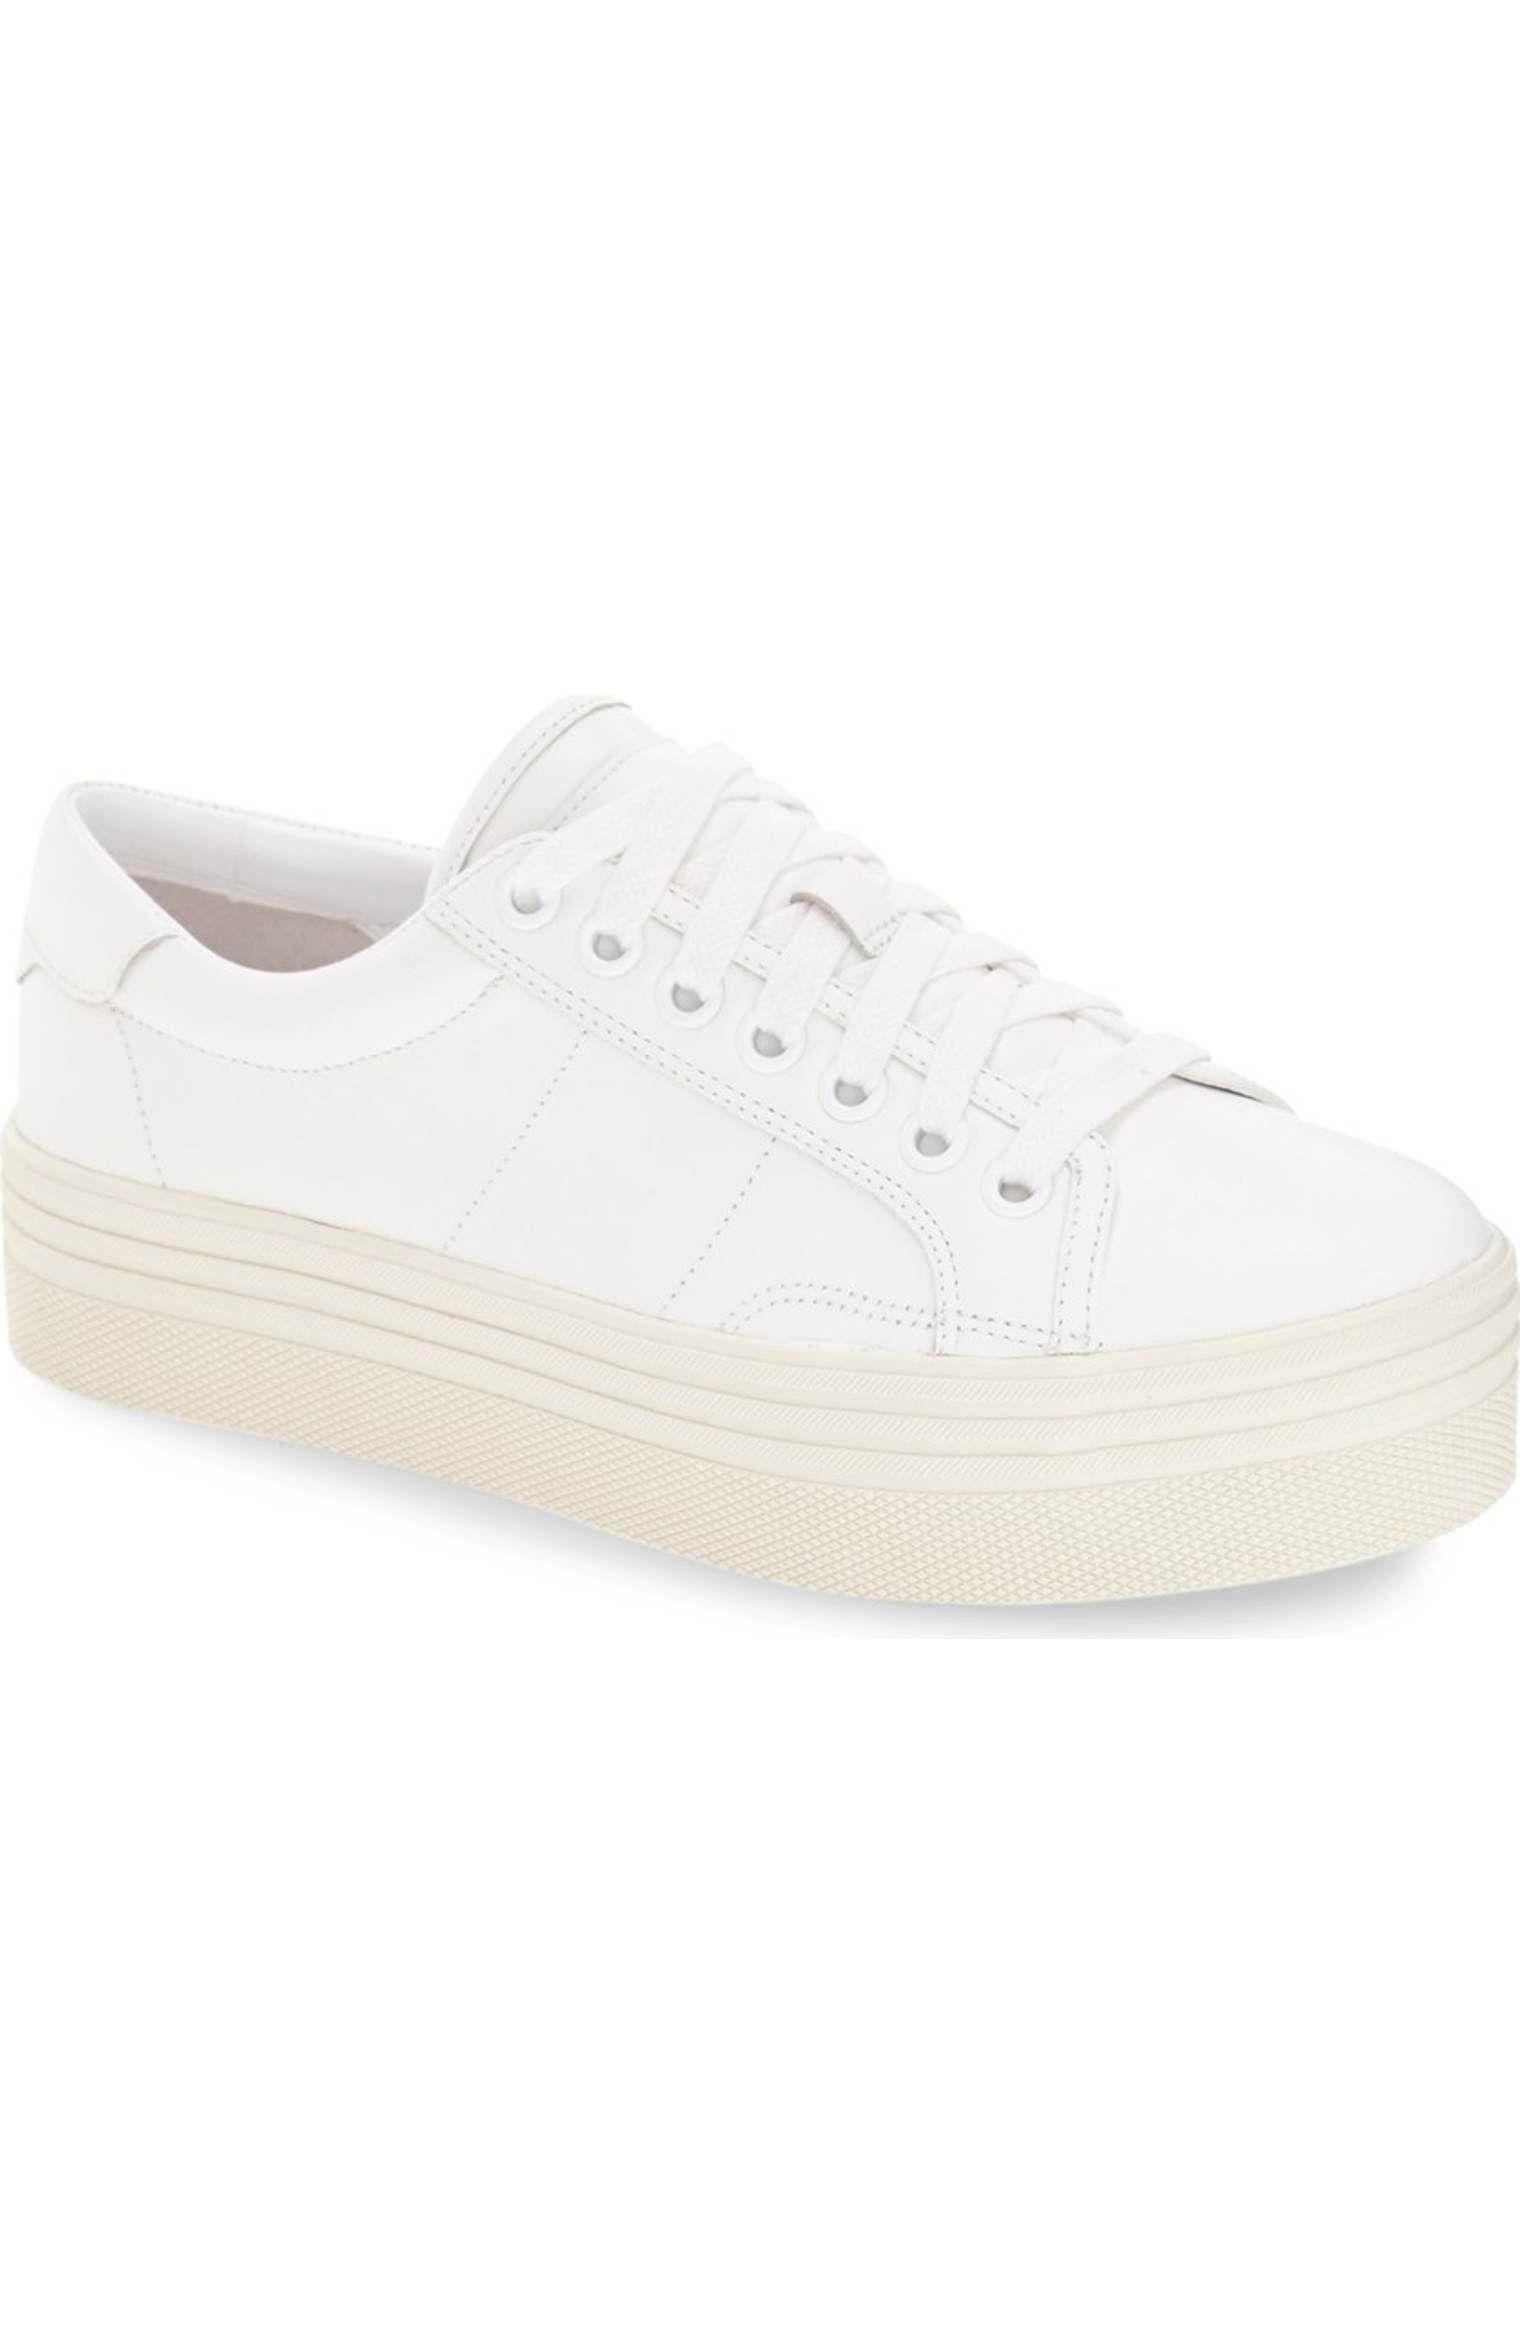 5a270f9b9122 Main Image - Marc Fisher LTD Emmy Platform Sneaker (Women)